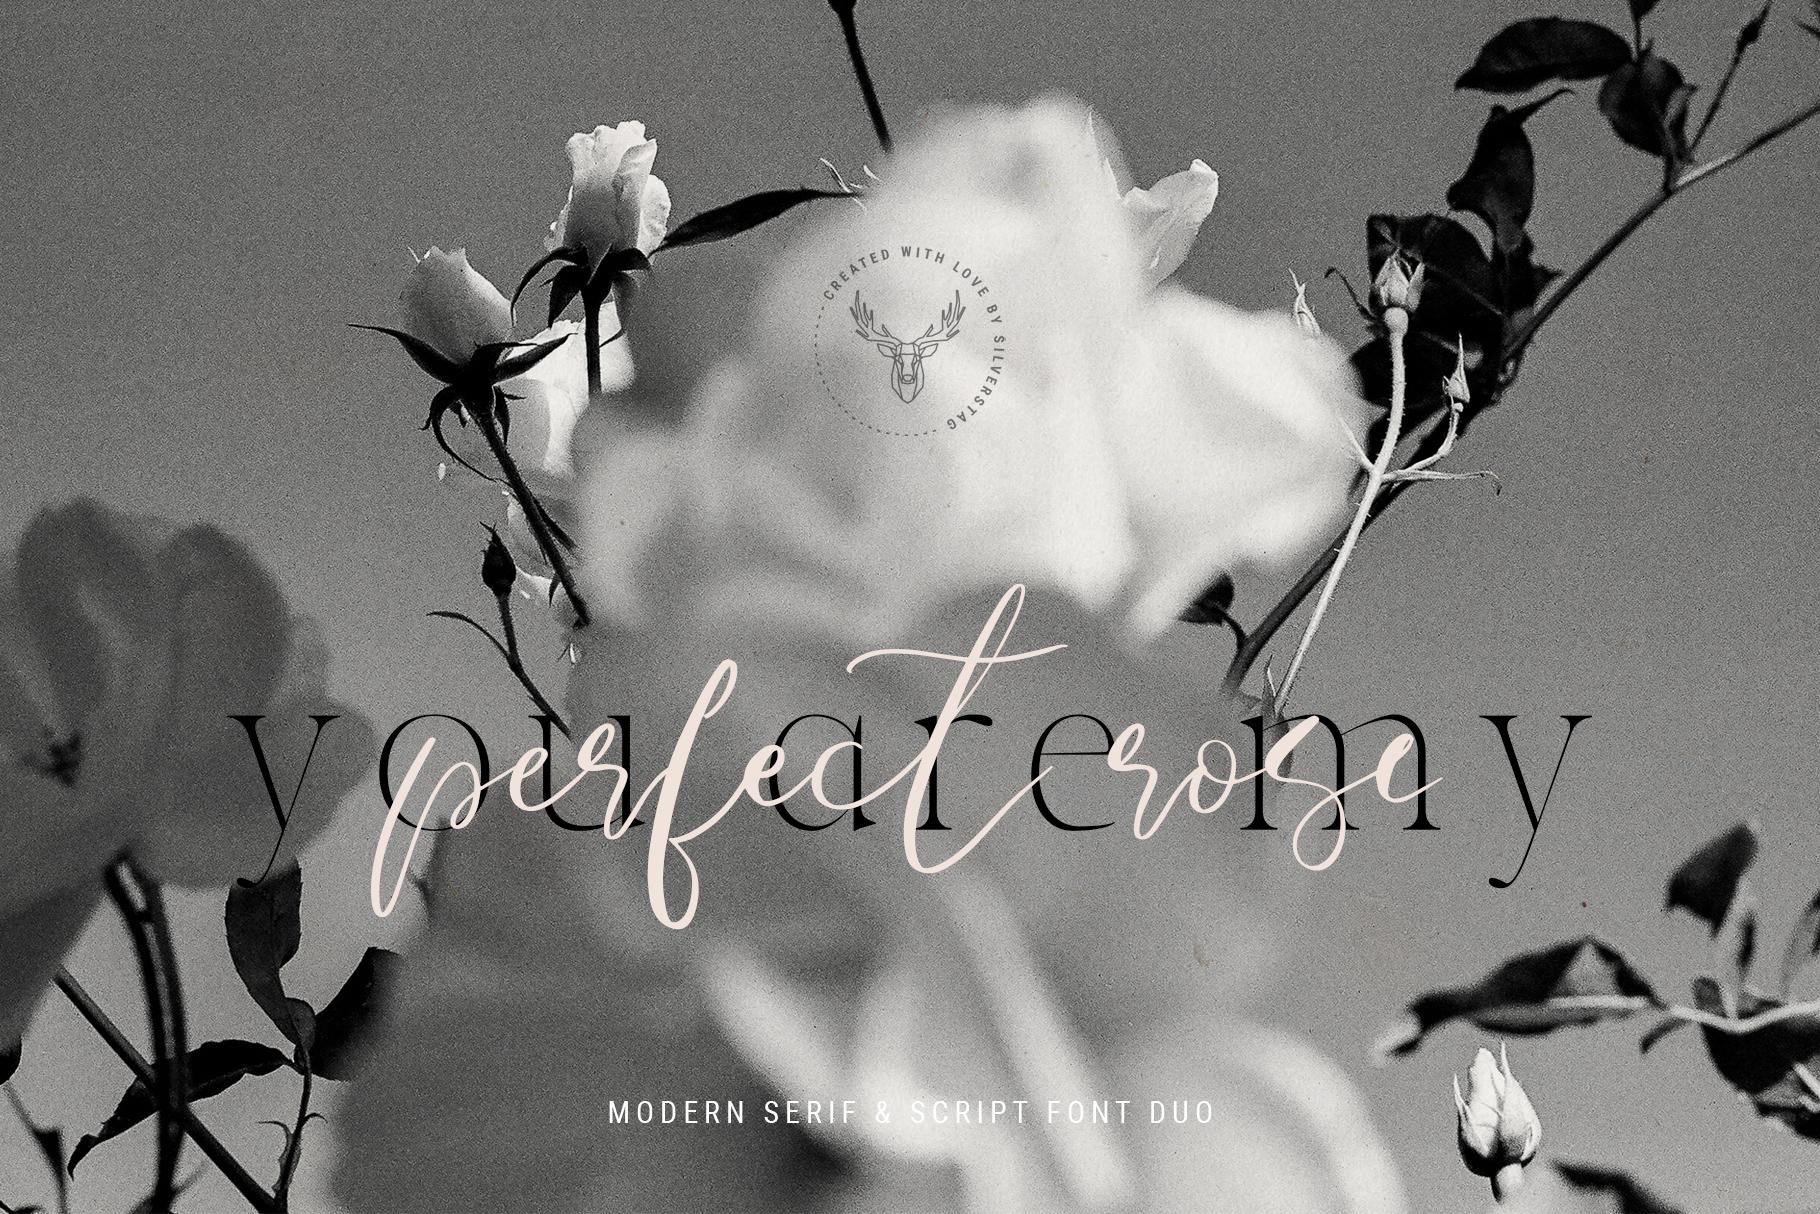 Verona Amore - Modern Serif & Script Font Duo & Extras example image 13